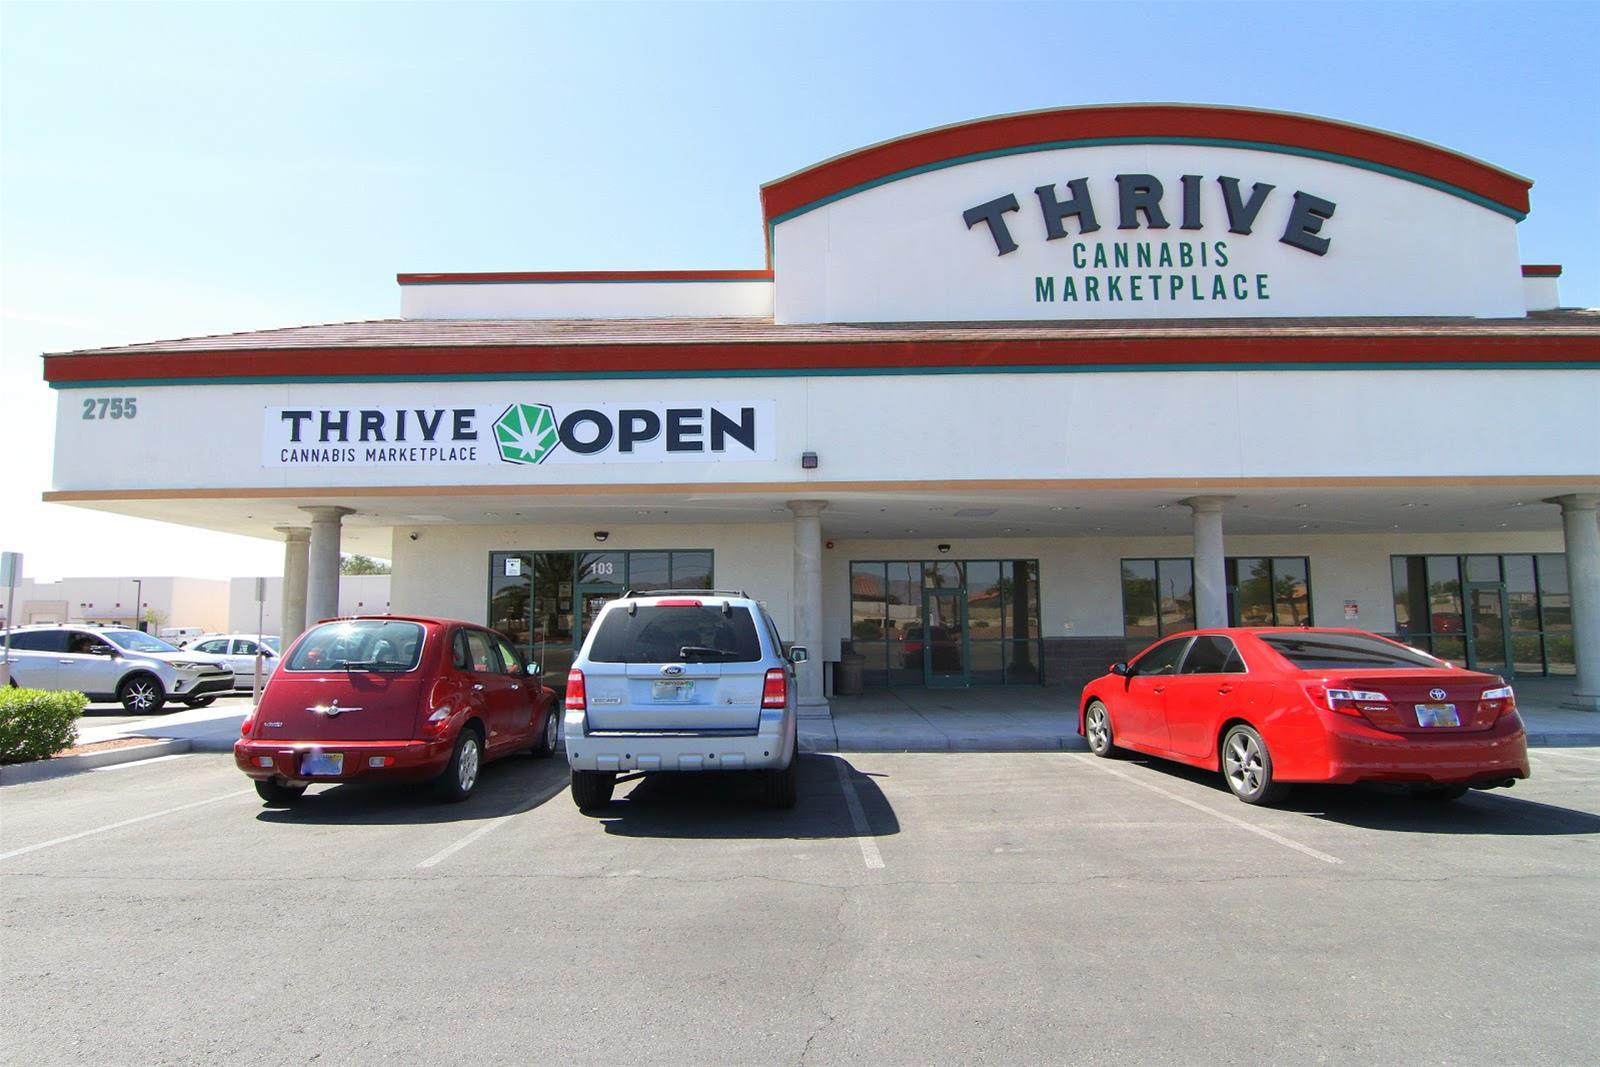 Thrive-Cannabis-Marketplace-North-Las-Vegas-4